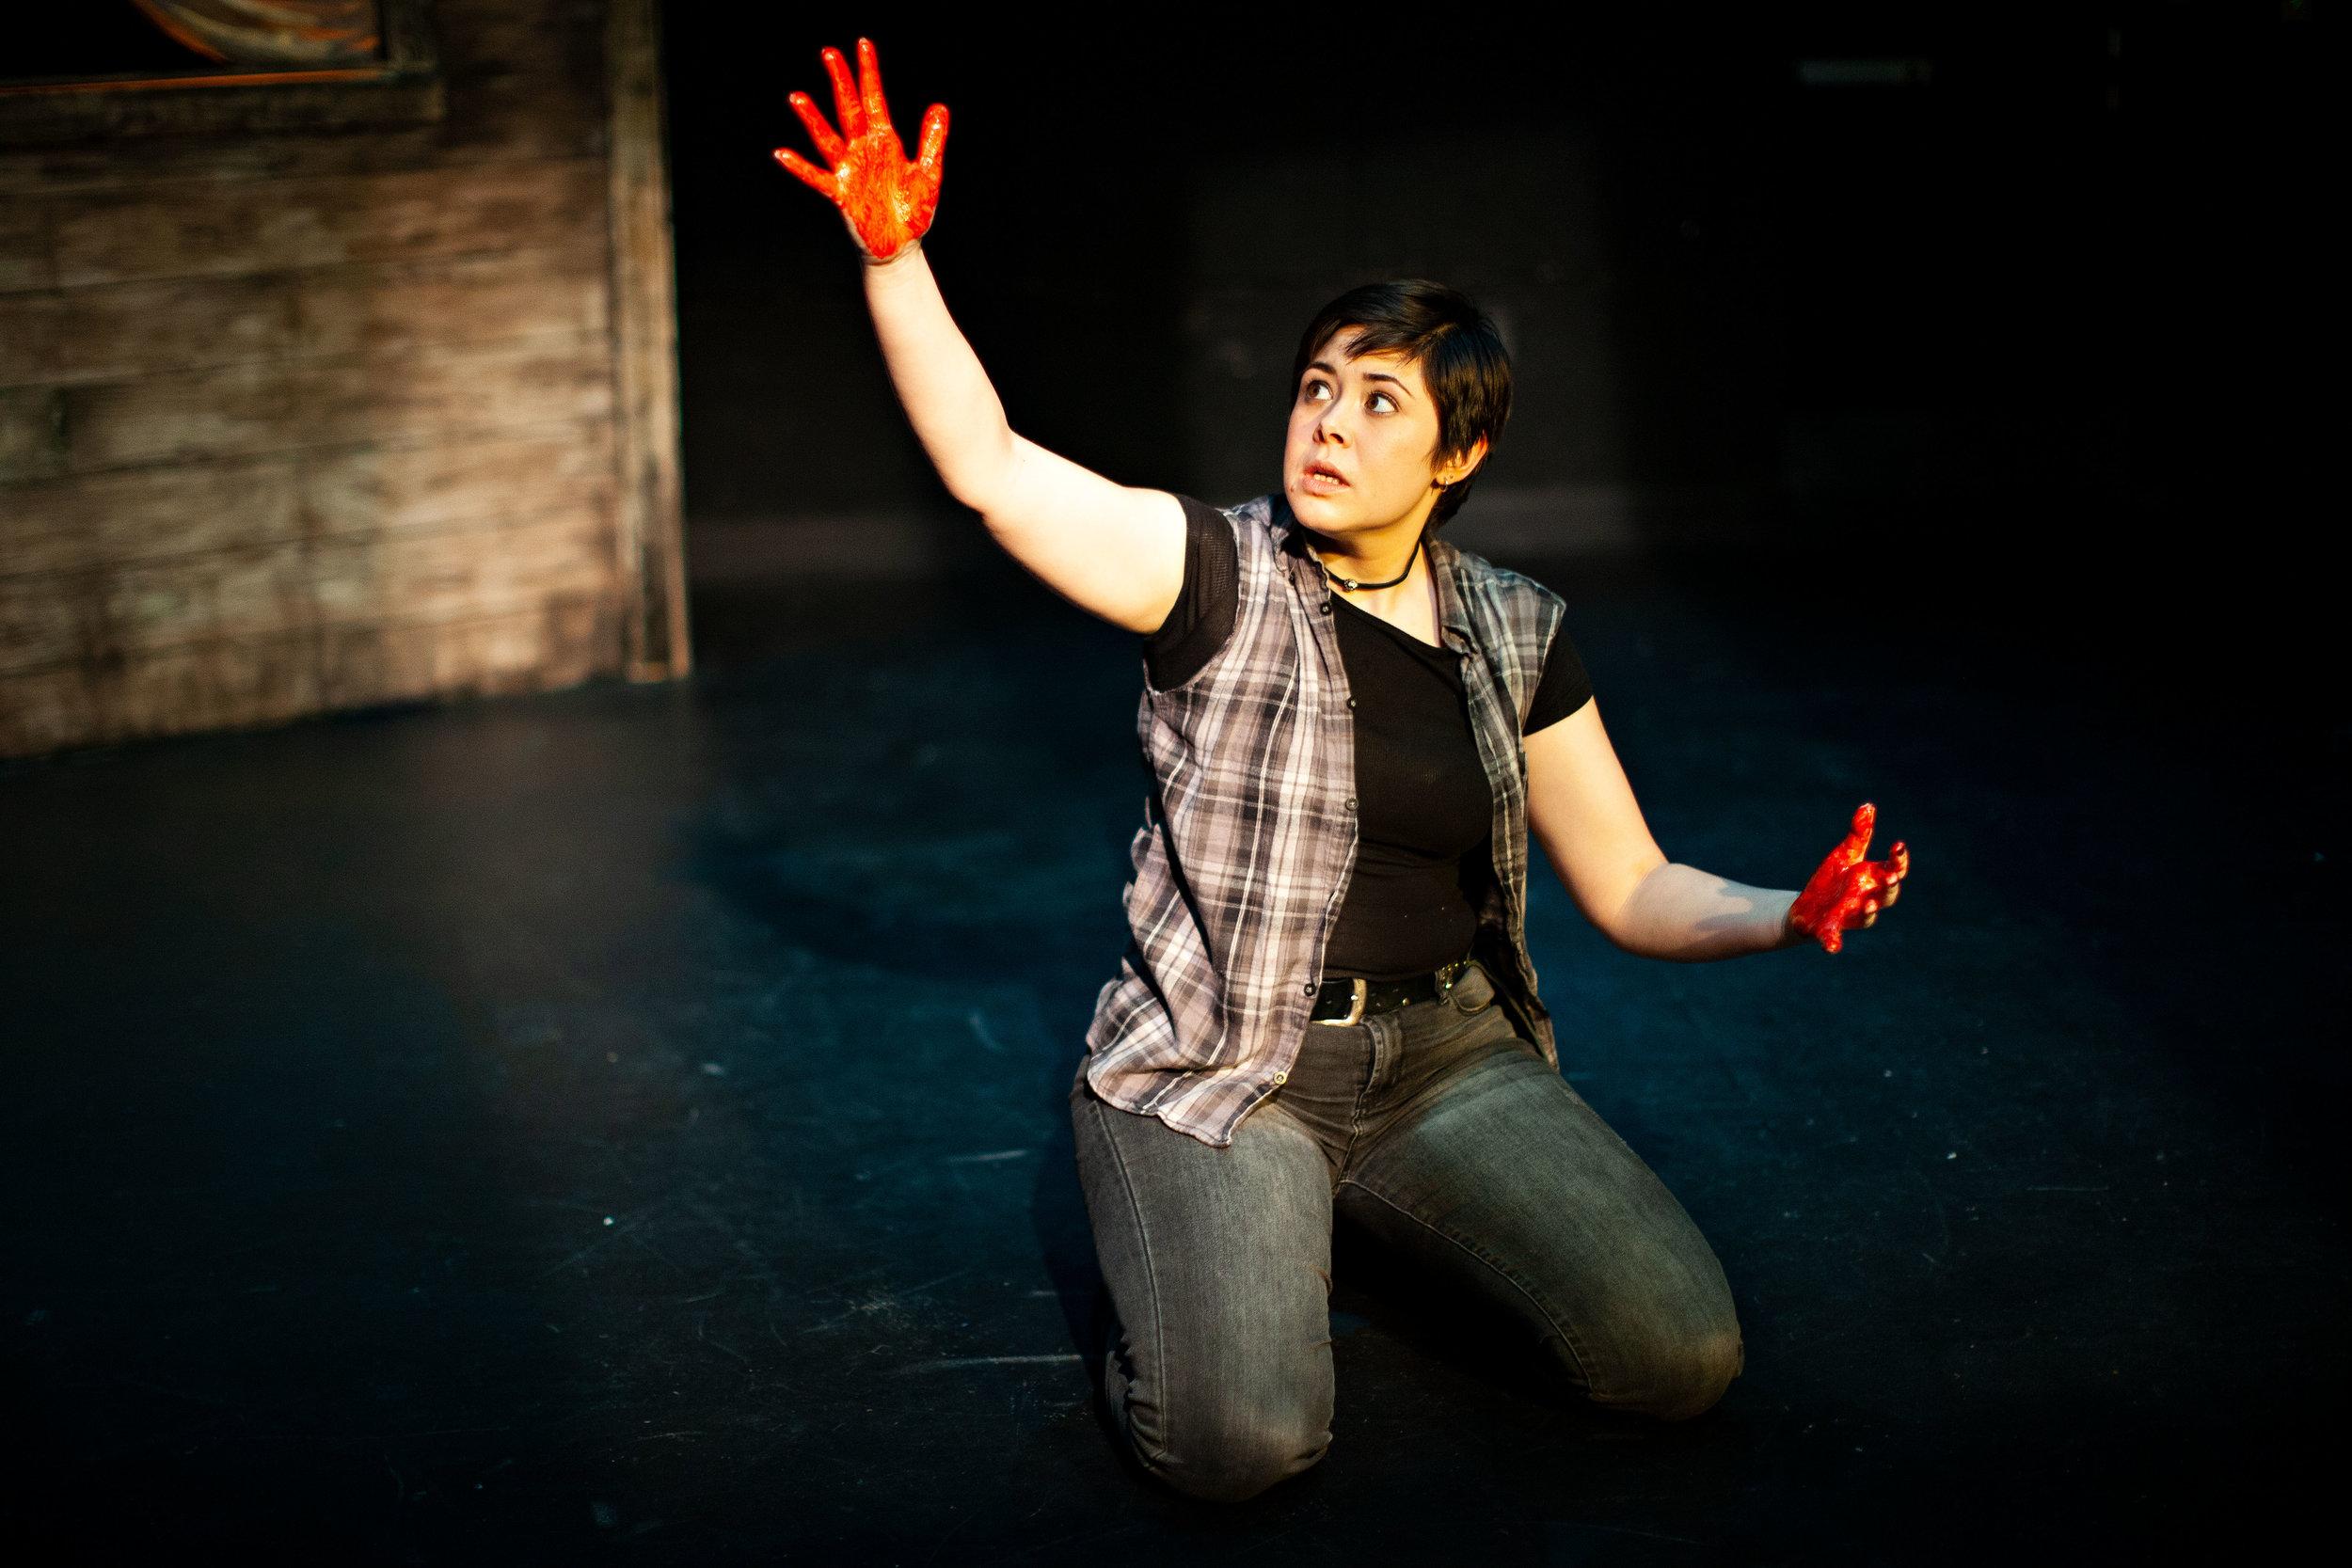 Macbeth with bloody hands.jpg